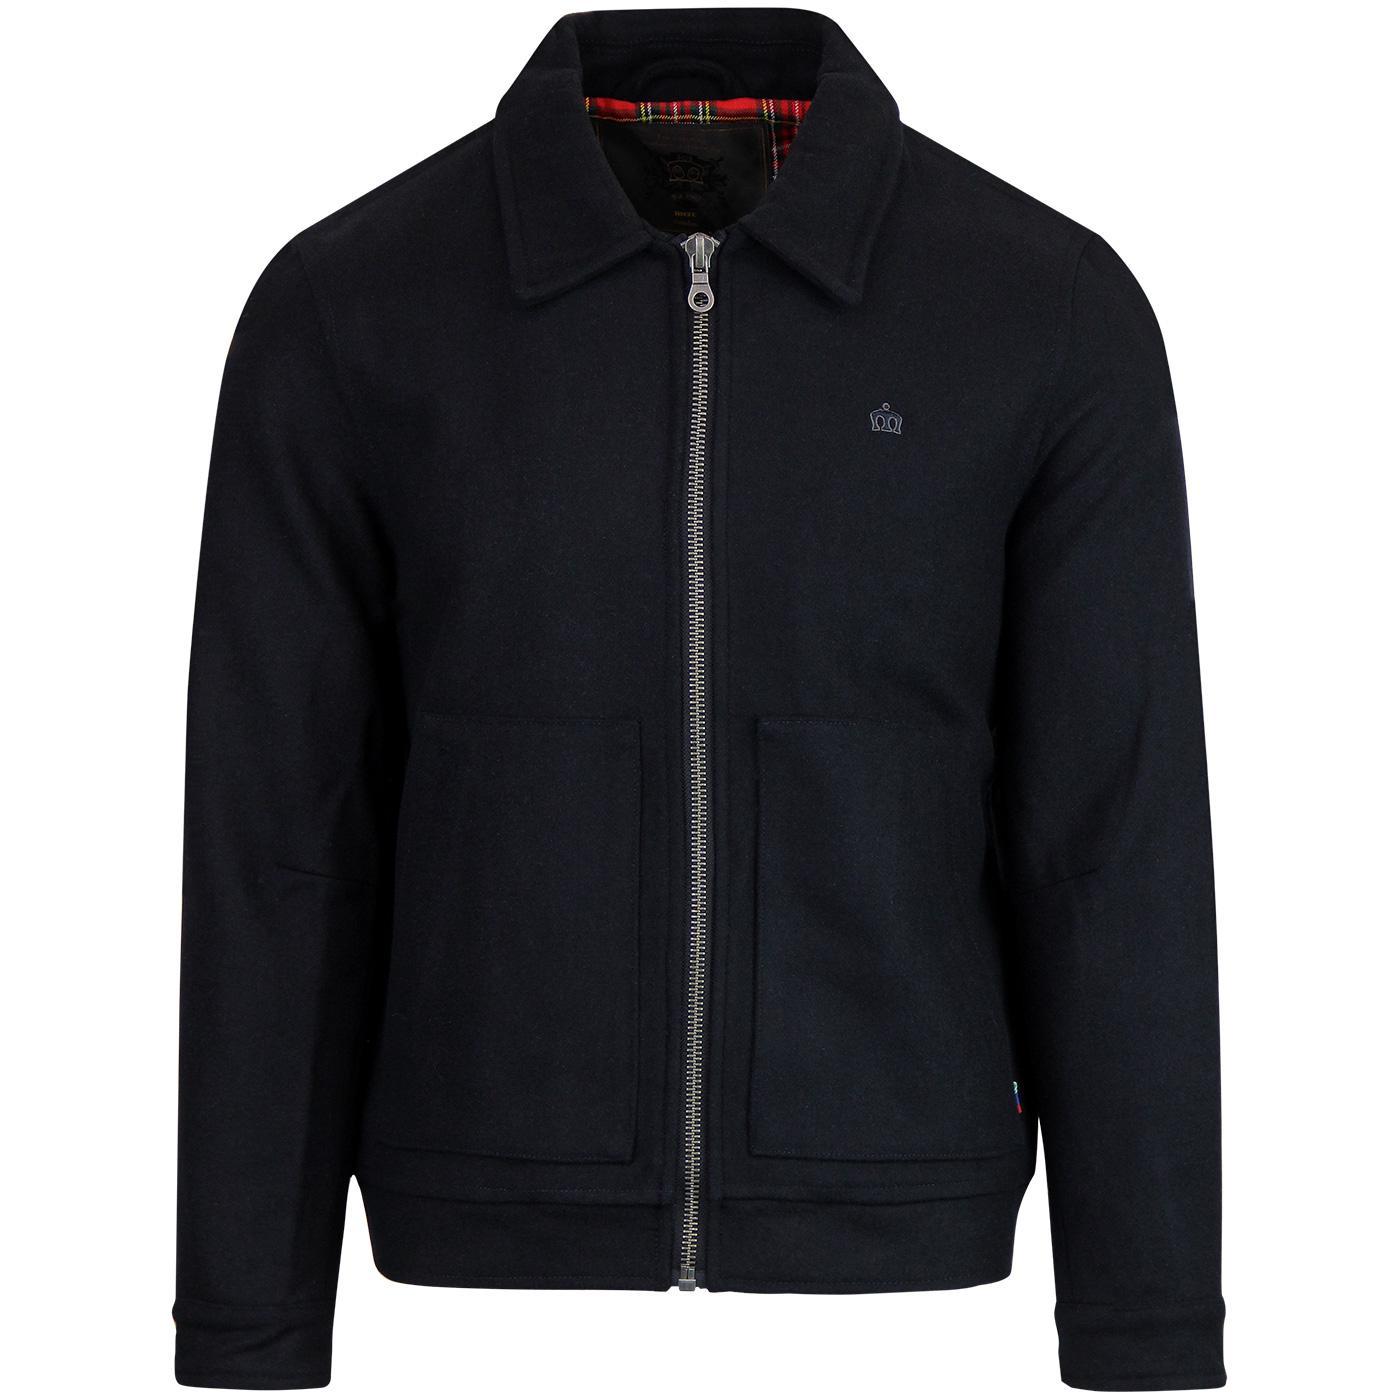 Ladbroke MERC Retro Mod Wool Jacket Dark Navy